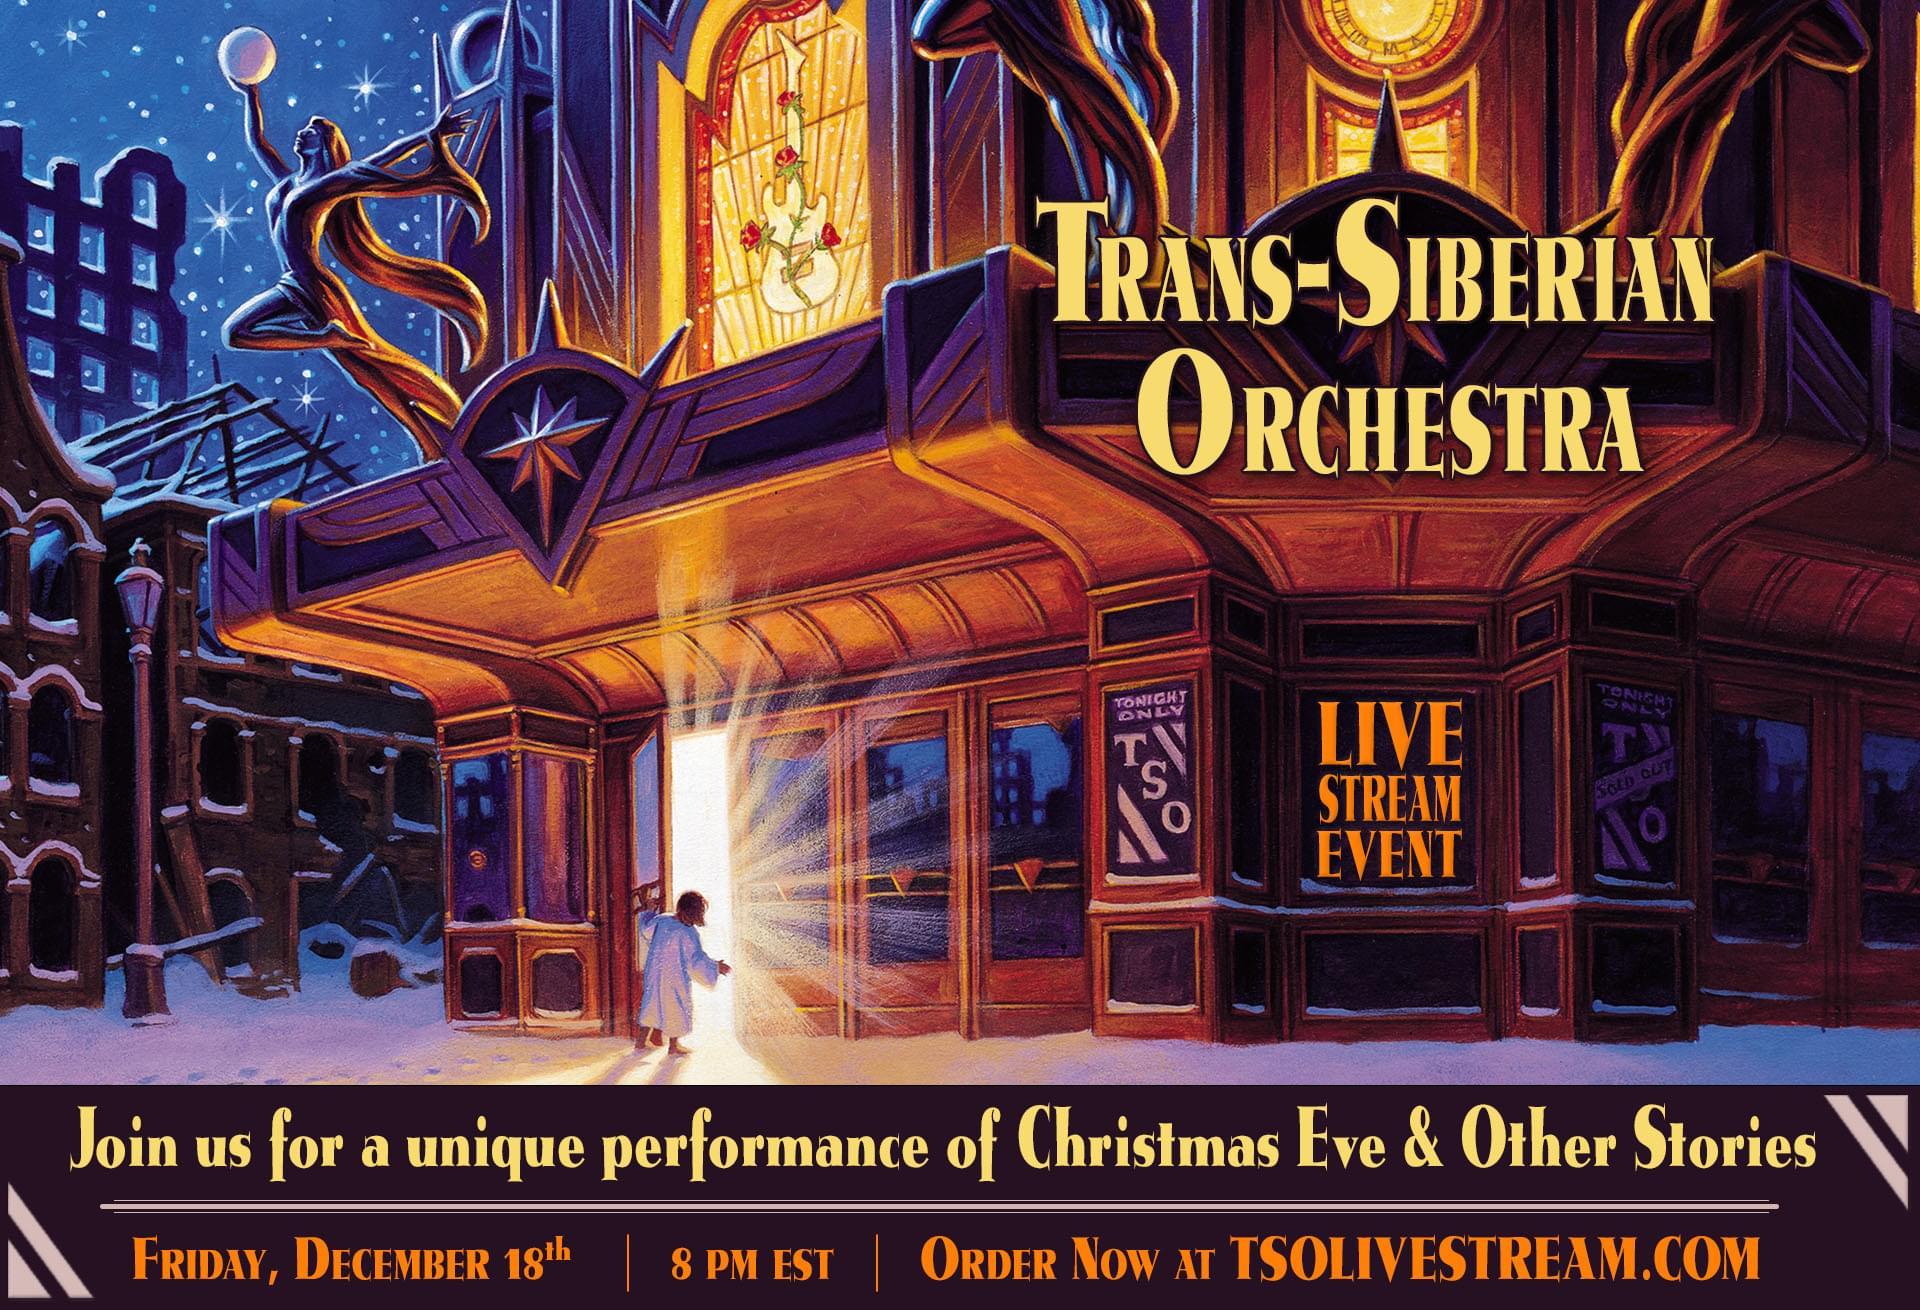 Trans-Siberian Orchestra Livestream!